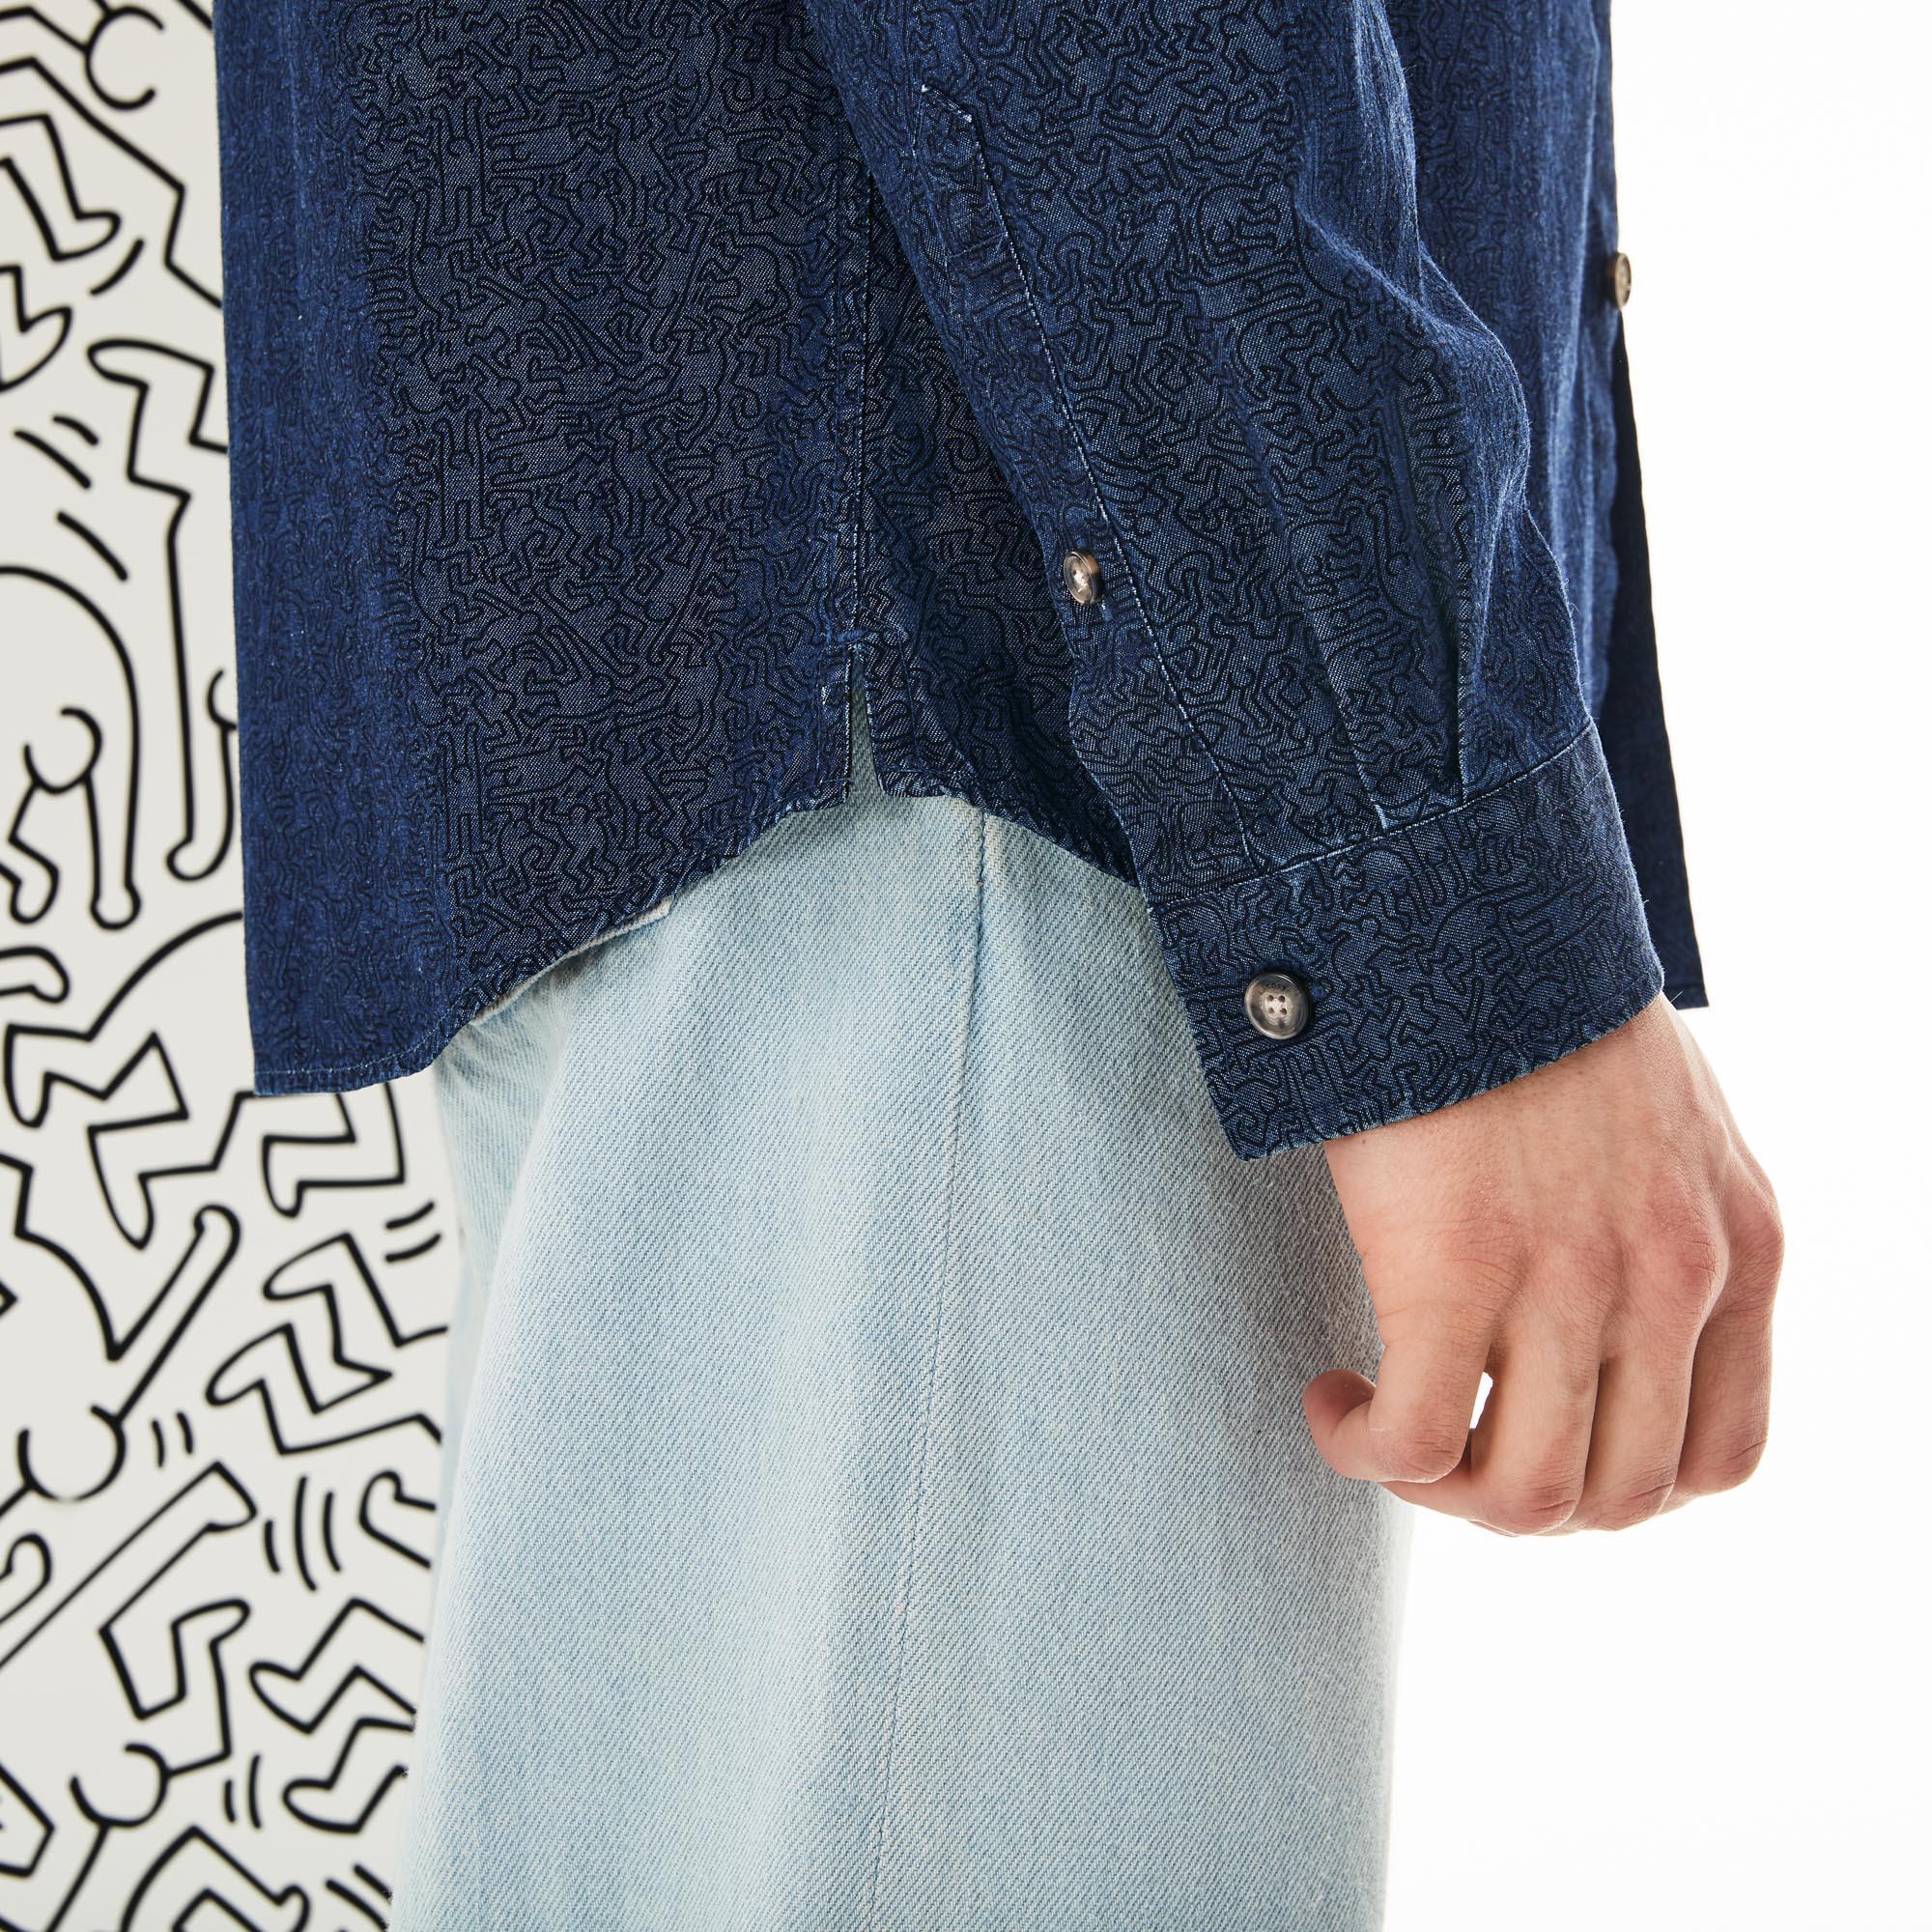 Lacoste X Keith Haring Erkek Slim Fit Lacivert Gömlek